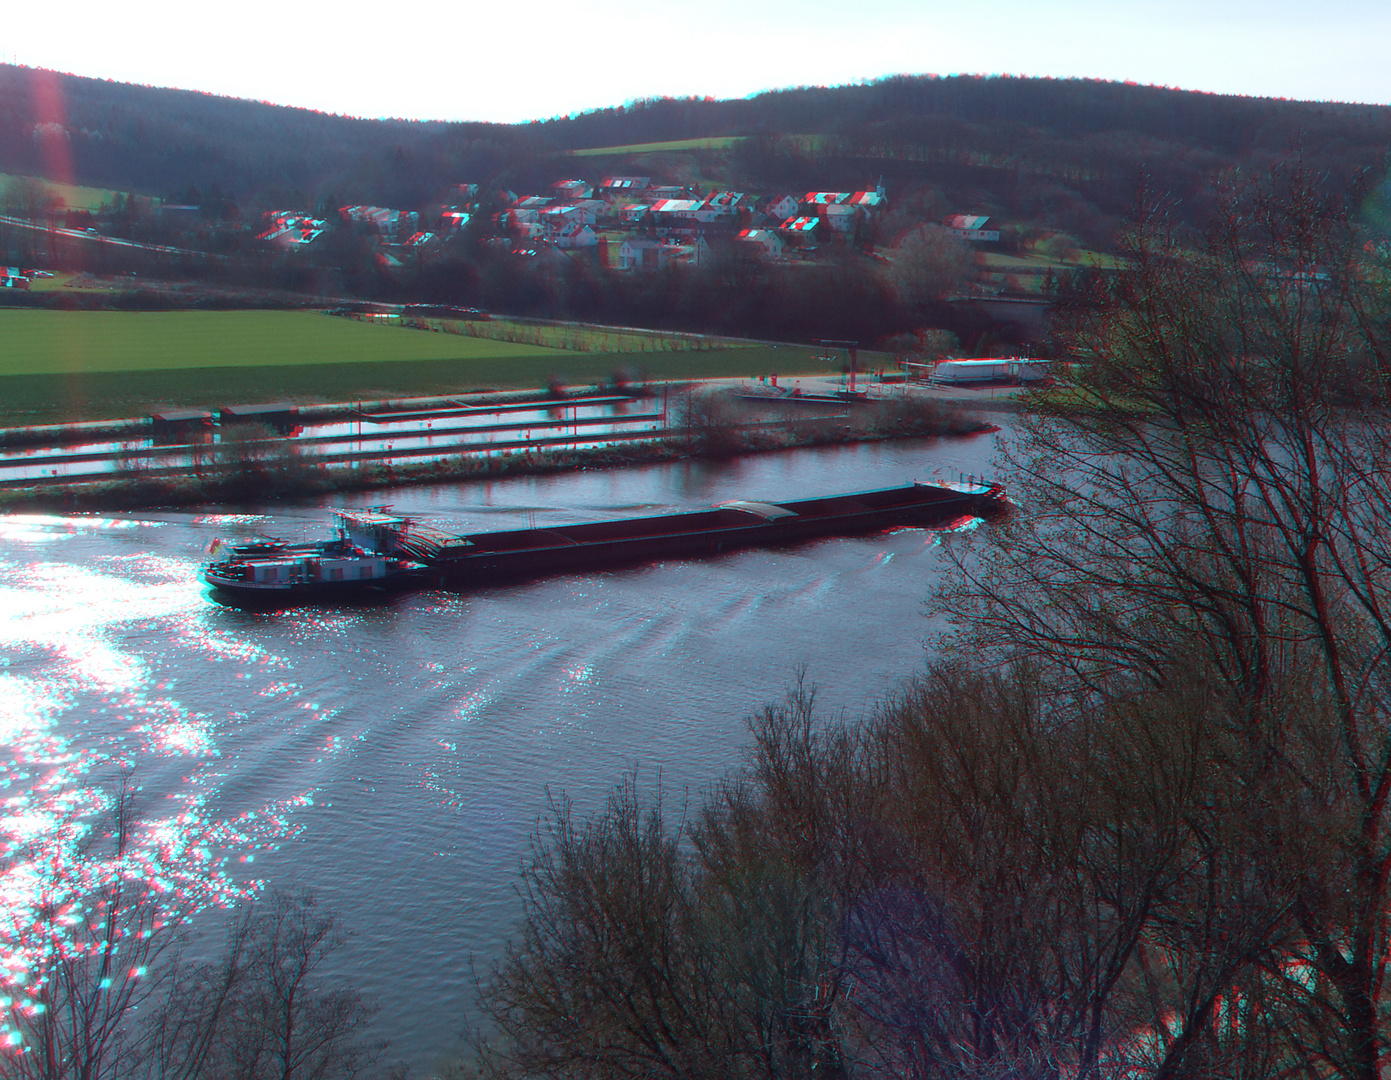 Donau-Schiff